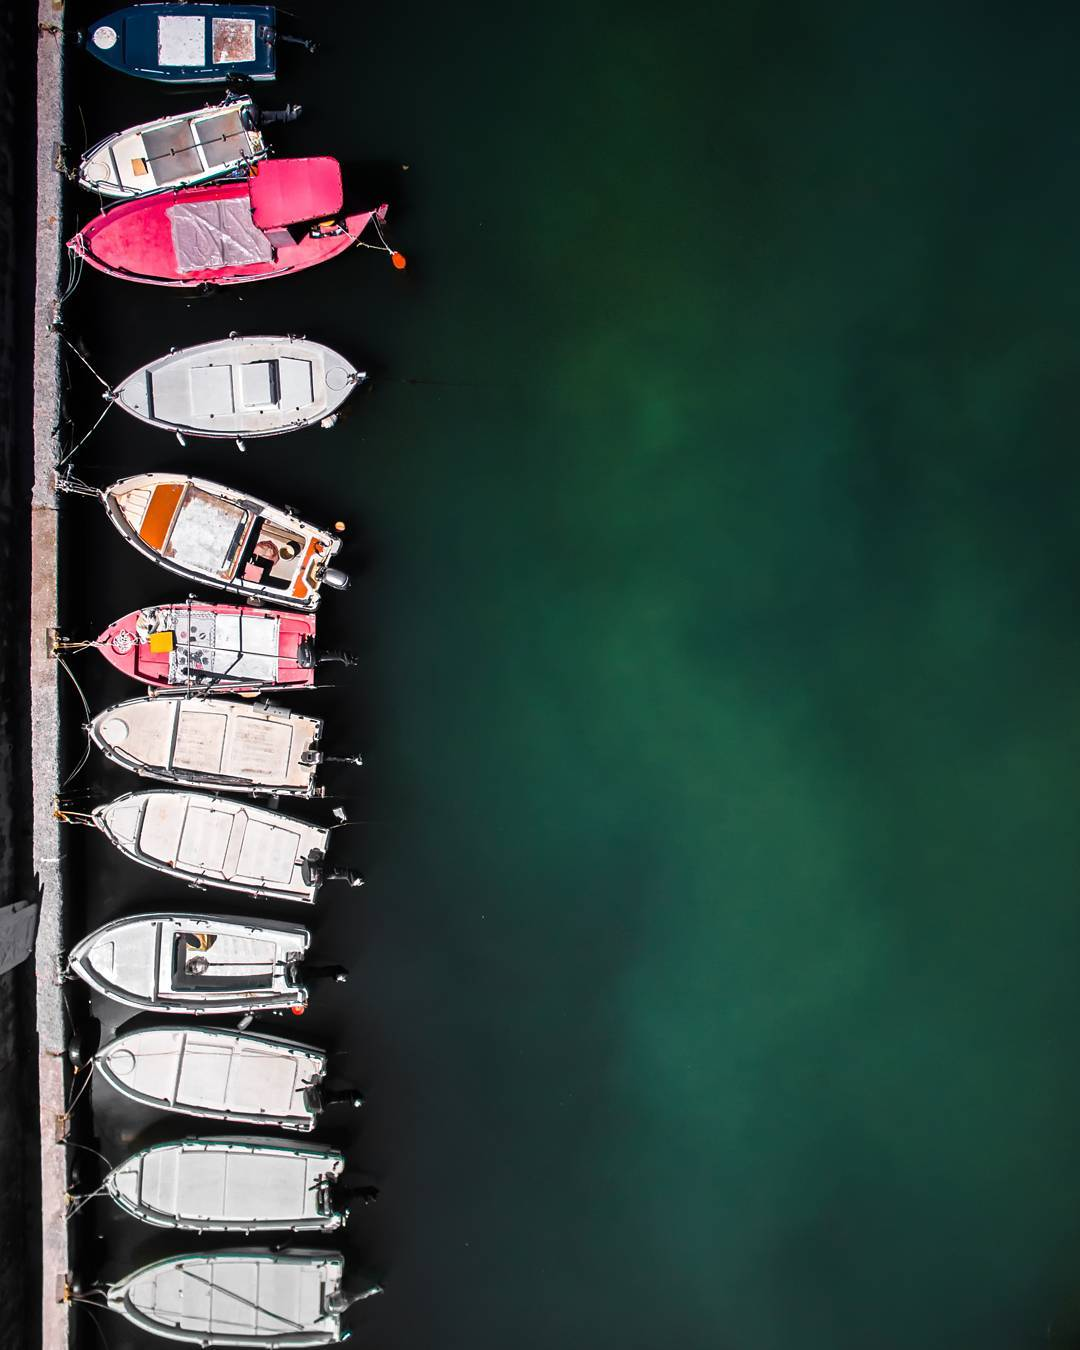 20838638 736024203251890 55862277387059200 n - Οι εντυπωσιακές φωτογραφίες από την Λάρισα και τα παράλια της από «ψηλά»